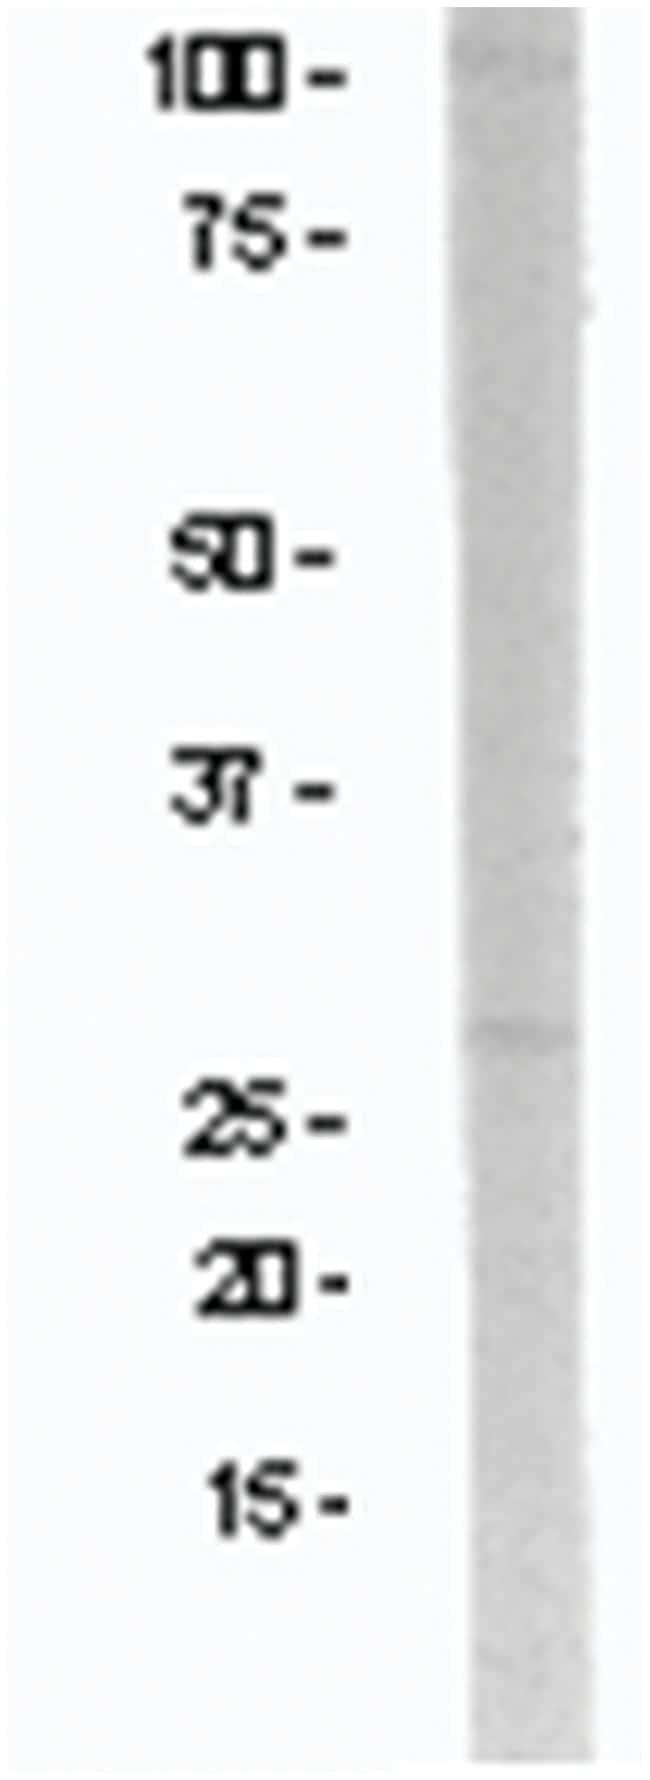 NR2B Rabbit anti-Mouse, Polyclonal, MilliporeSigma 250µg; Unlabeled:Life